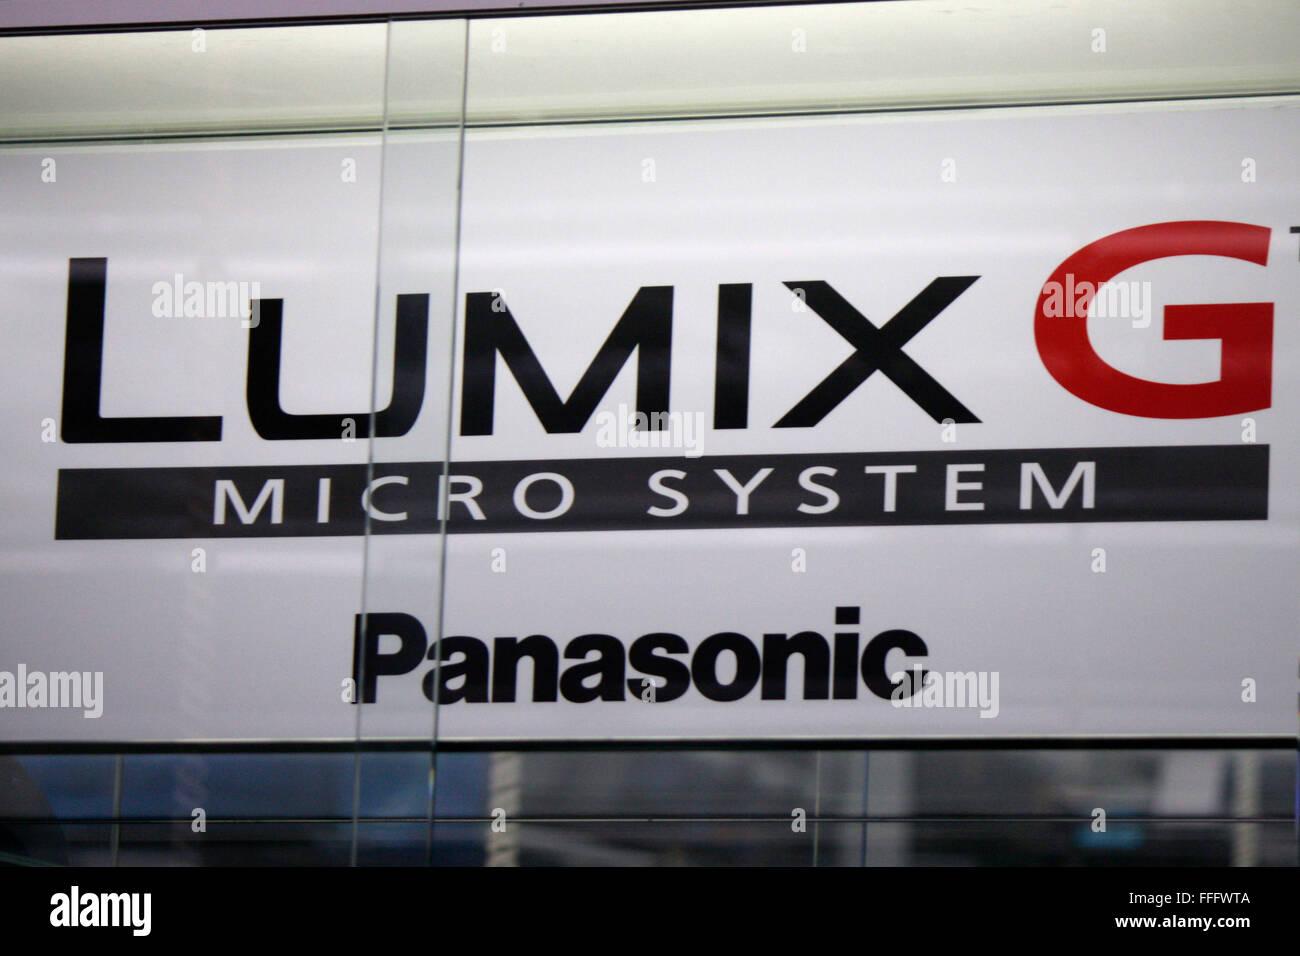 Markenname: 'Panasonic Lumix G', Dezember 2013, Berlin. - Stock Image